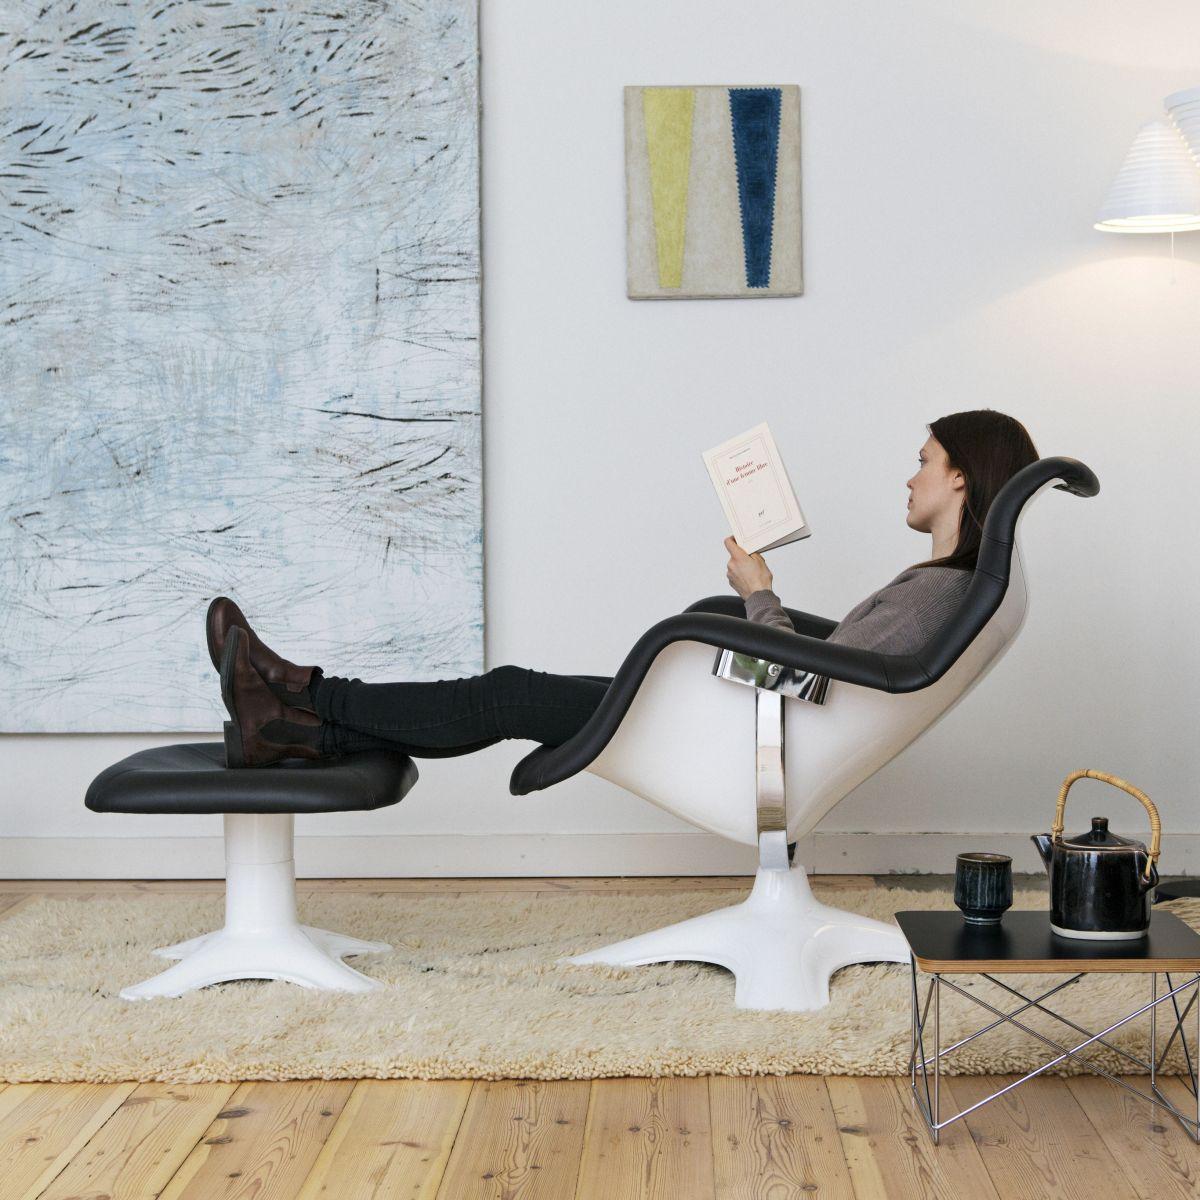 Karuselli Lounge Chair black leather Lukki Stool